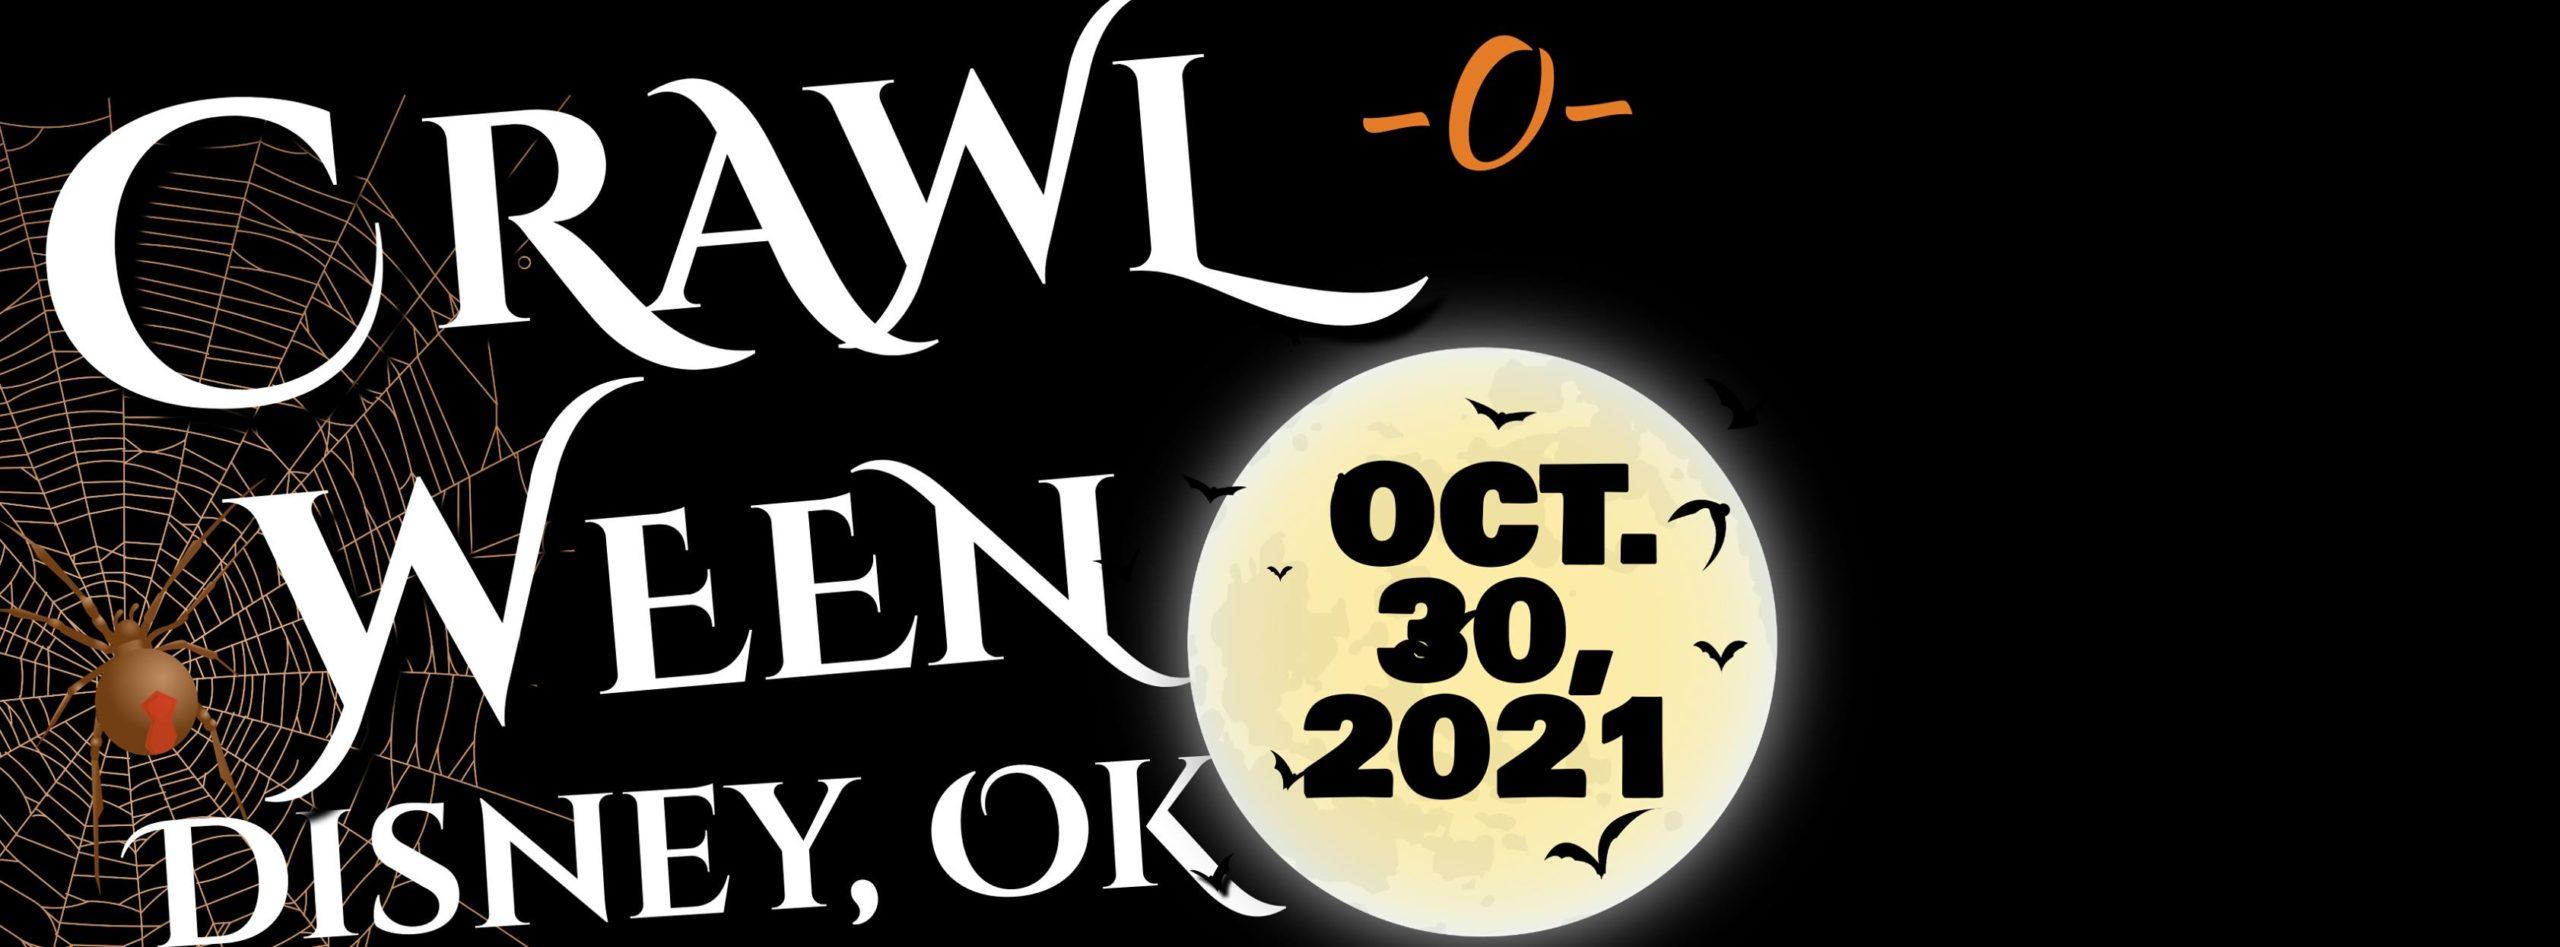 Crawl O Ween in Disney 2021